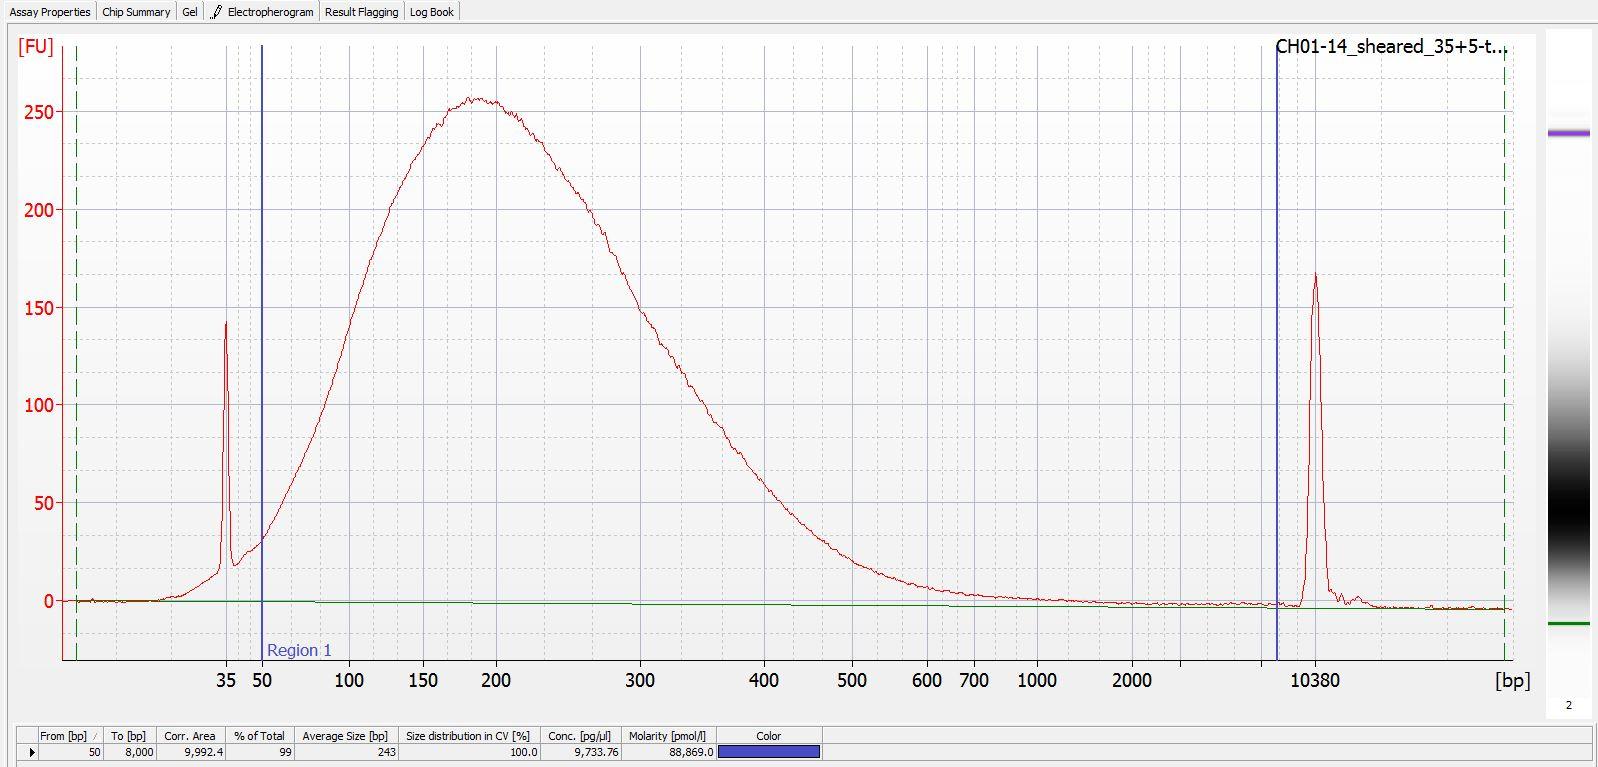 Sheared CH01-14 Bioanalyzer electropherogram